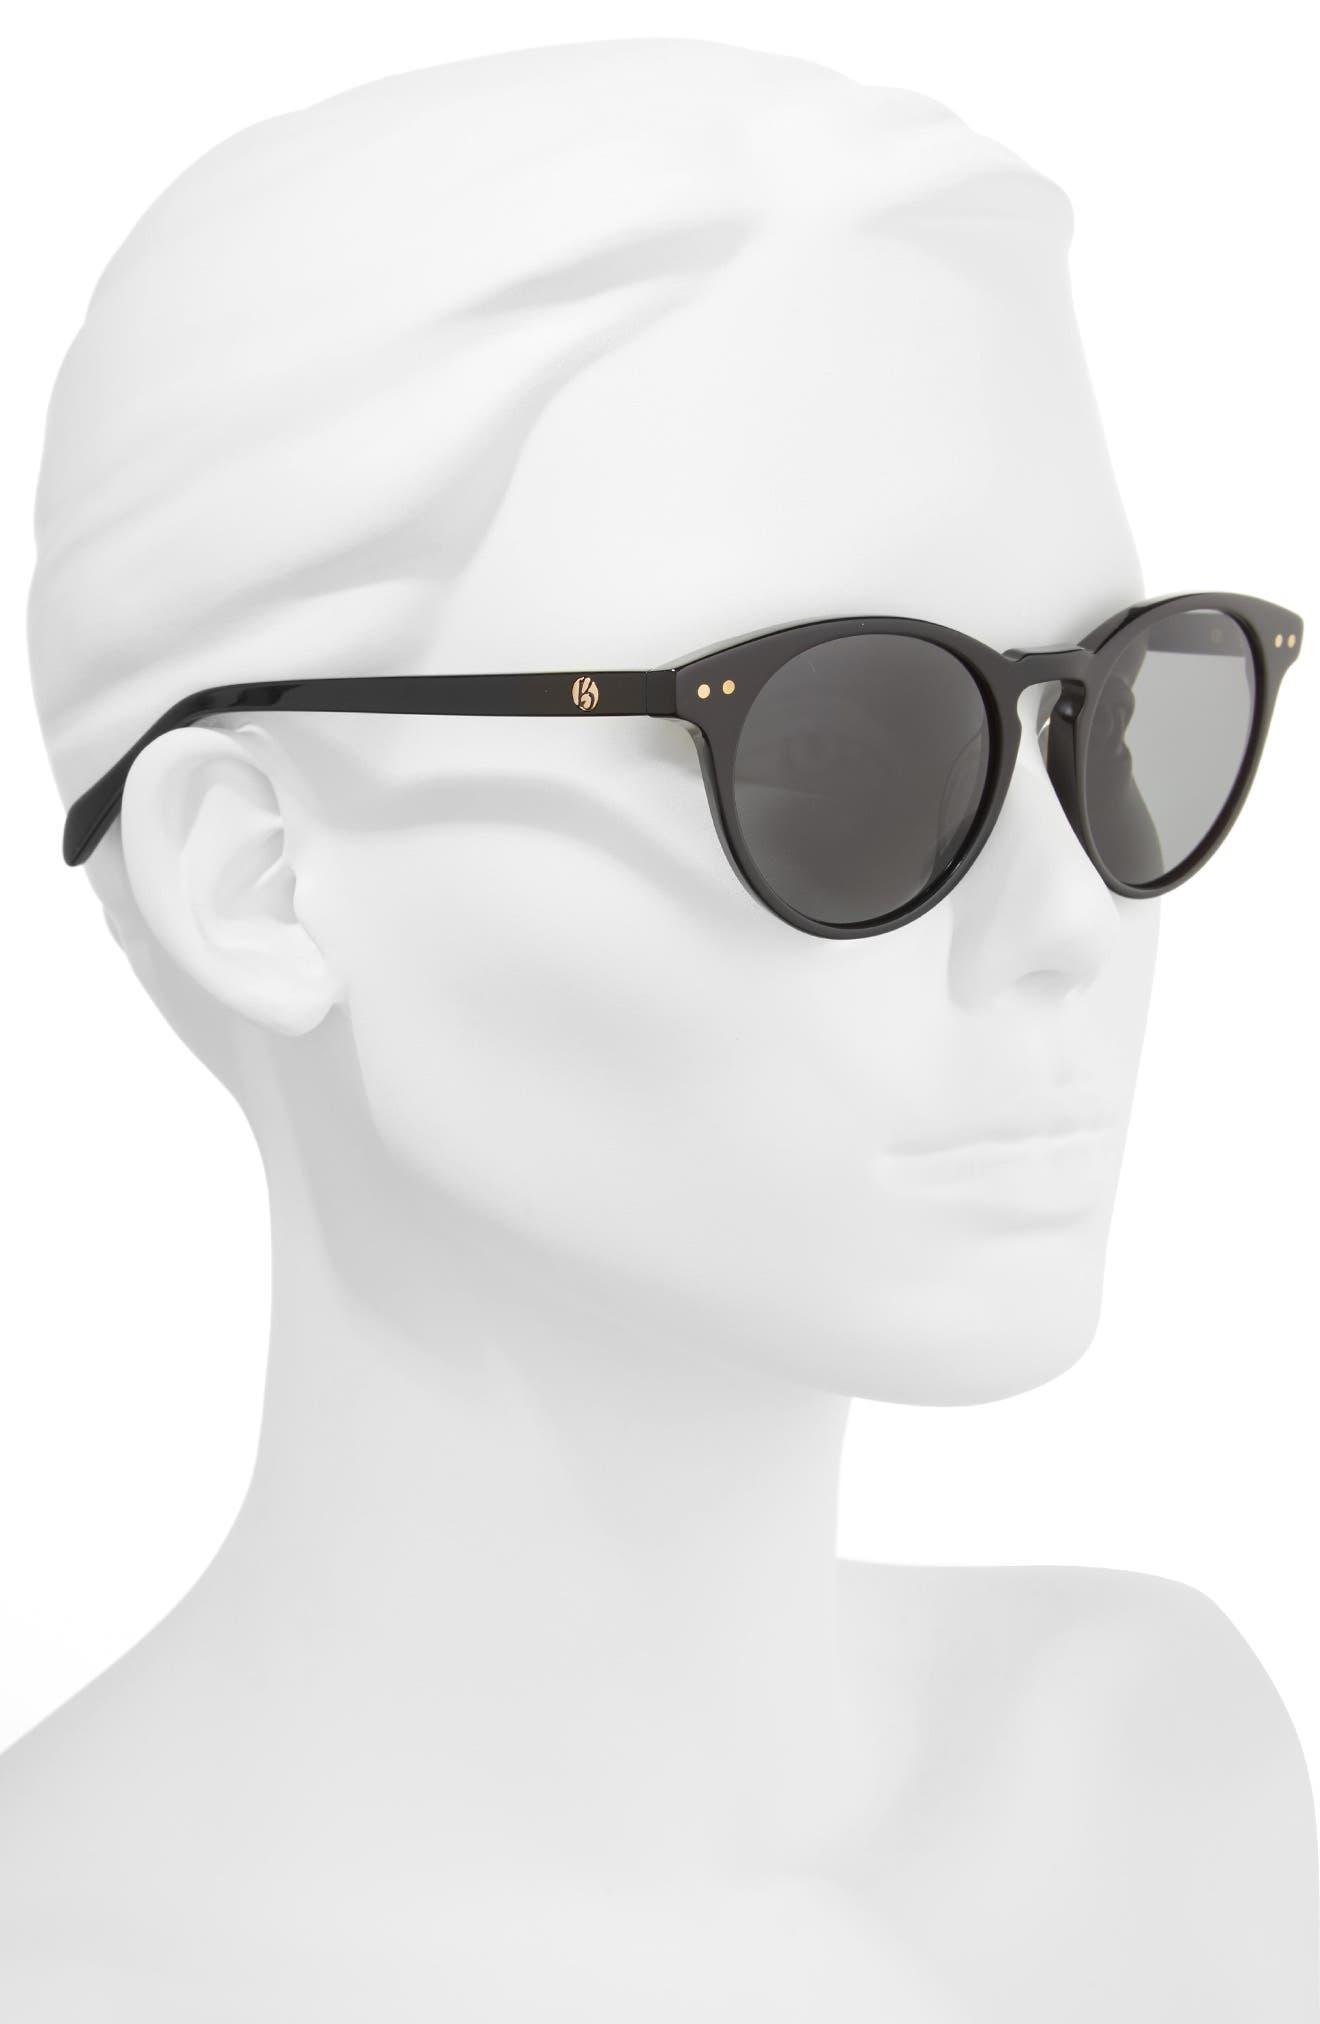 Oxford 49mm Polarized Sunglasses,                             Alternate thumbnail 2, color,                             001